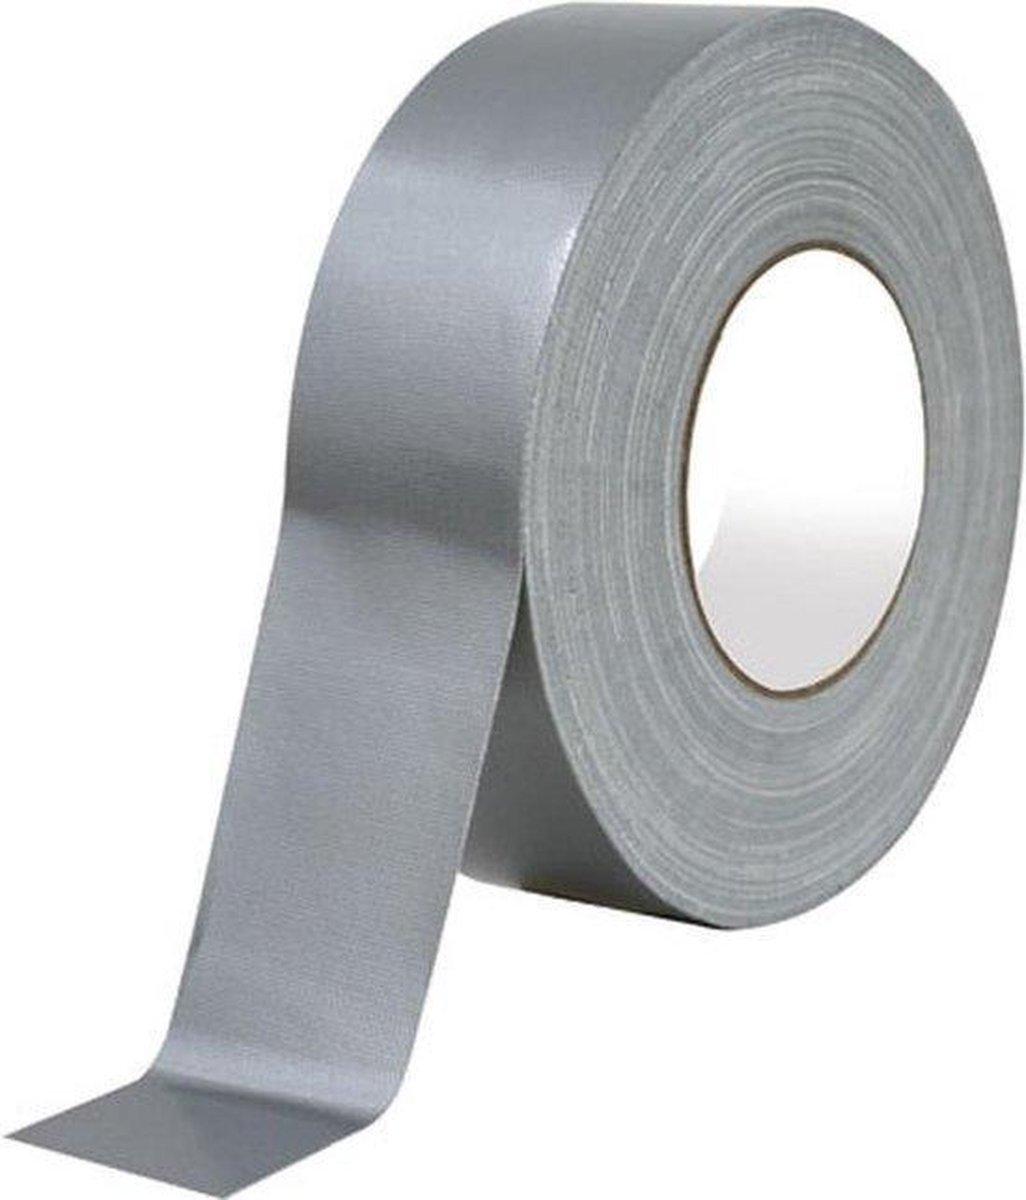 Klus & Reparatie Tape   Duct Tape   Duck Tape  Multi Purpose Tape   Waterproof  Zilver Tape   50 mm